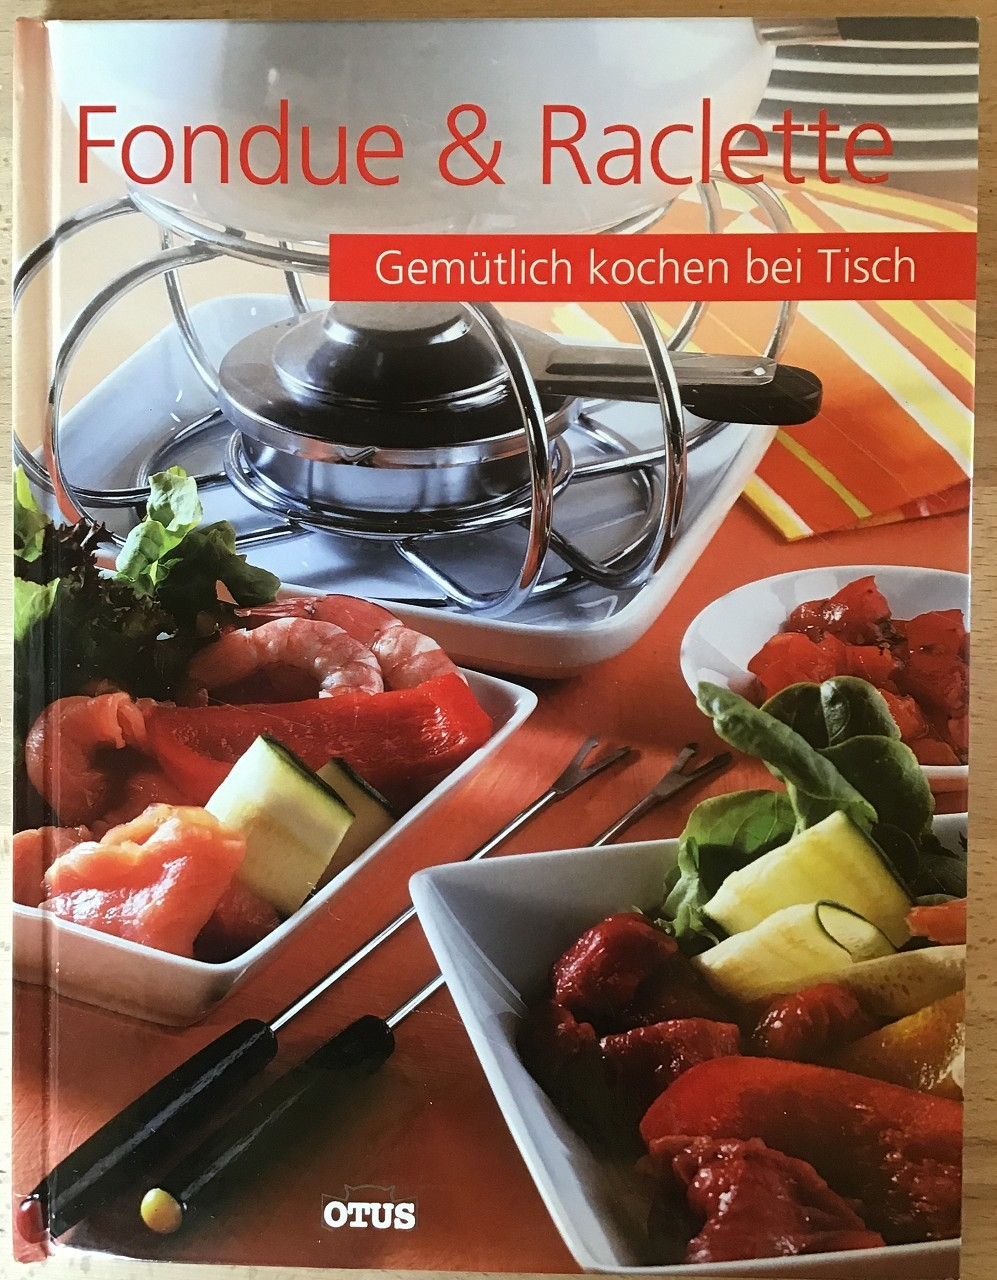 Fondue & Raclette : Gemütlich kochen bei Tisch.